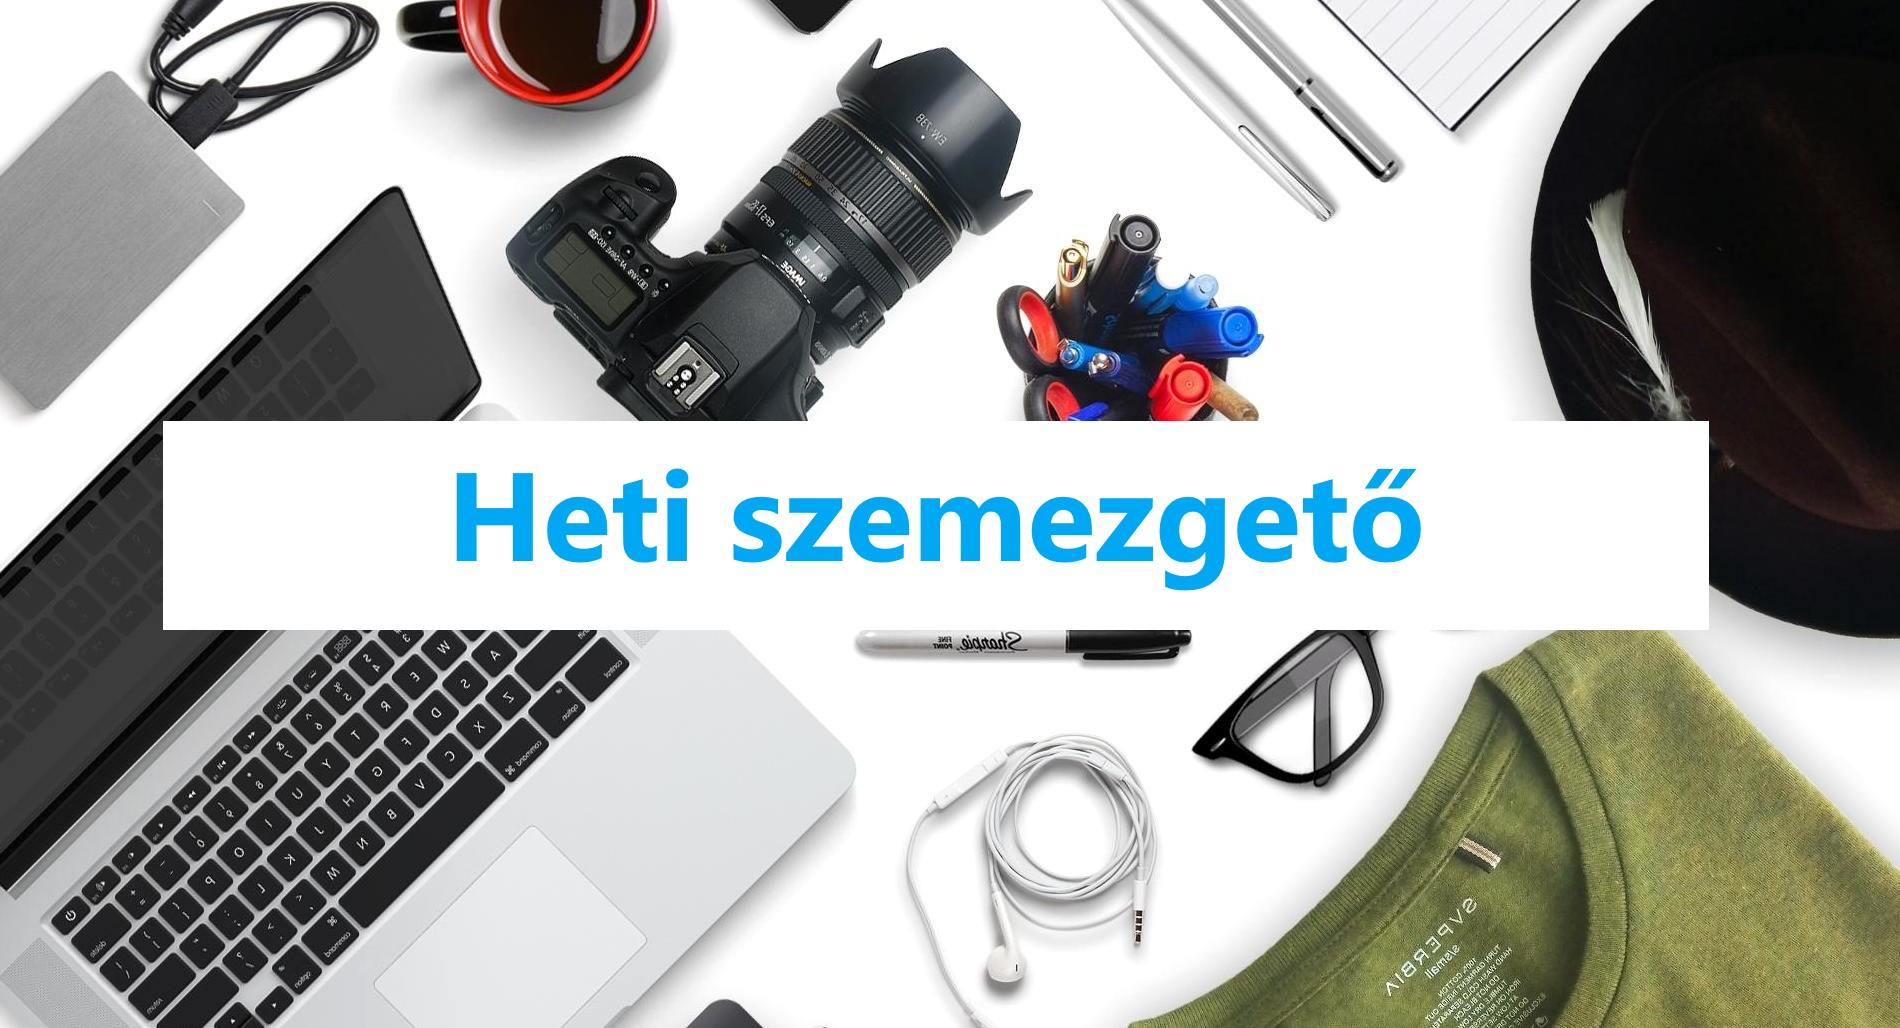 heti_szemezgeto_uj_17.jpg